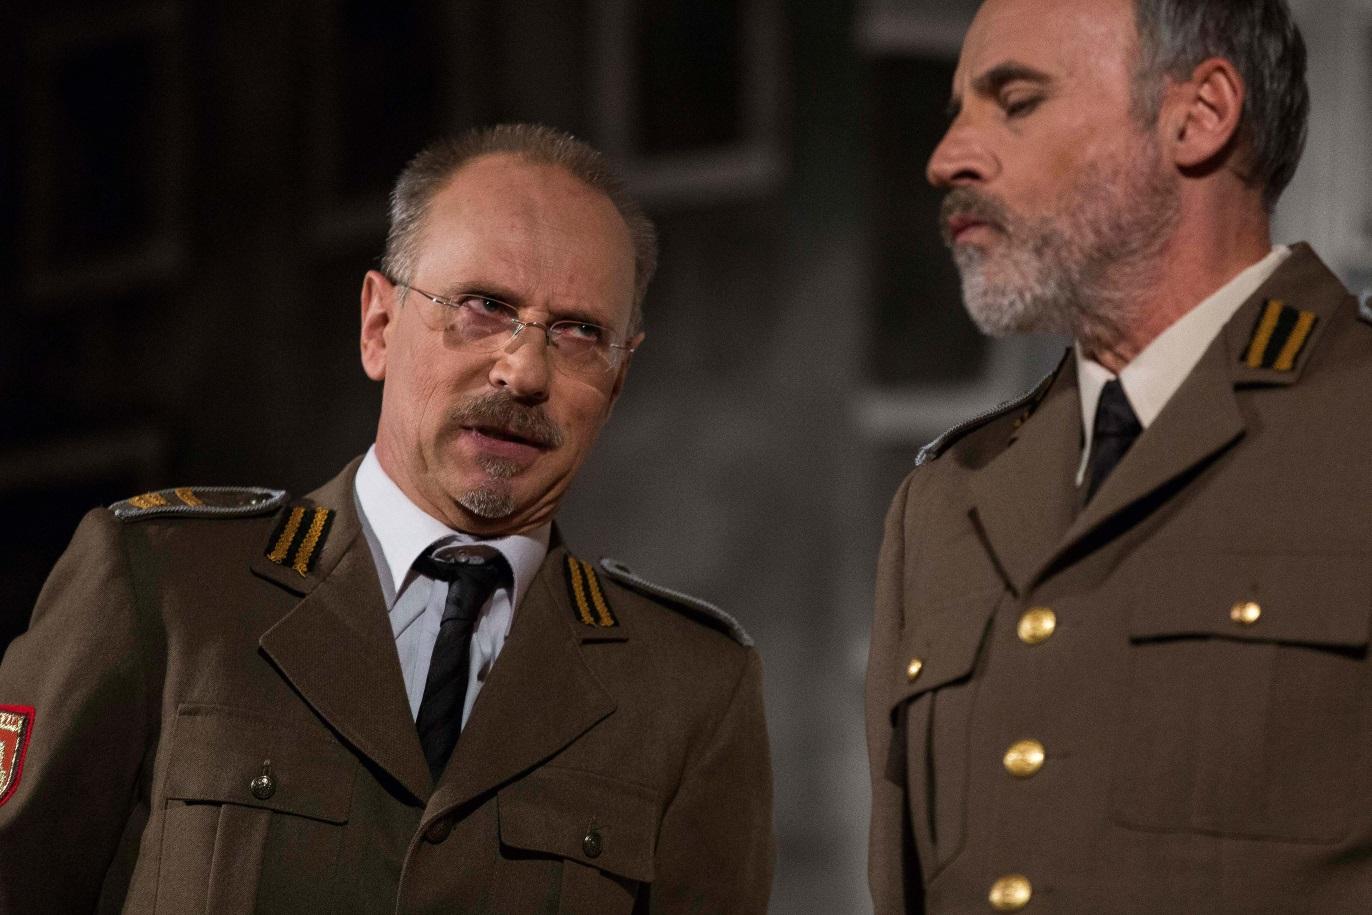 Valerio Milan (procuratore) e Ezio Baldo (giudice)